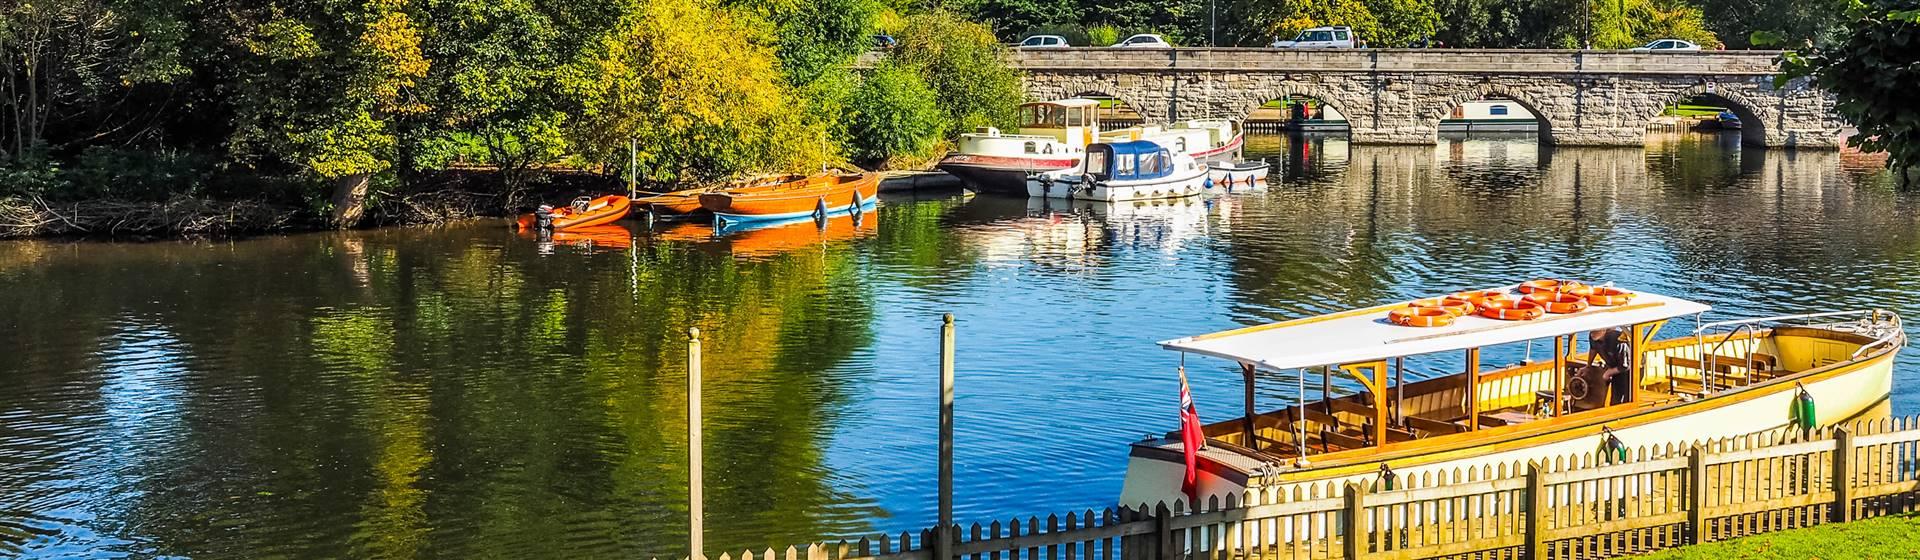 Althorpe & Stratford-upon-Avon